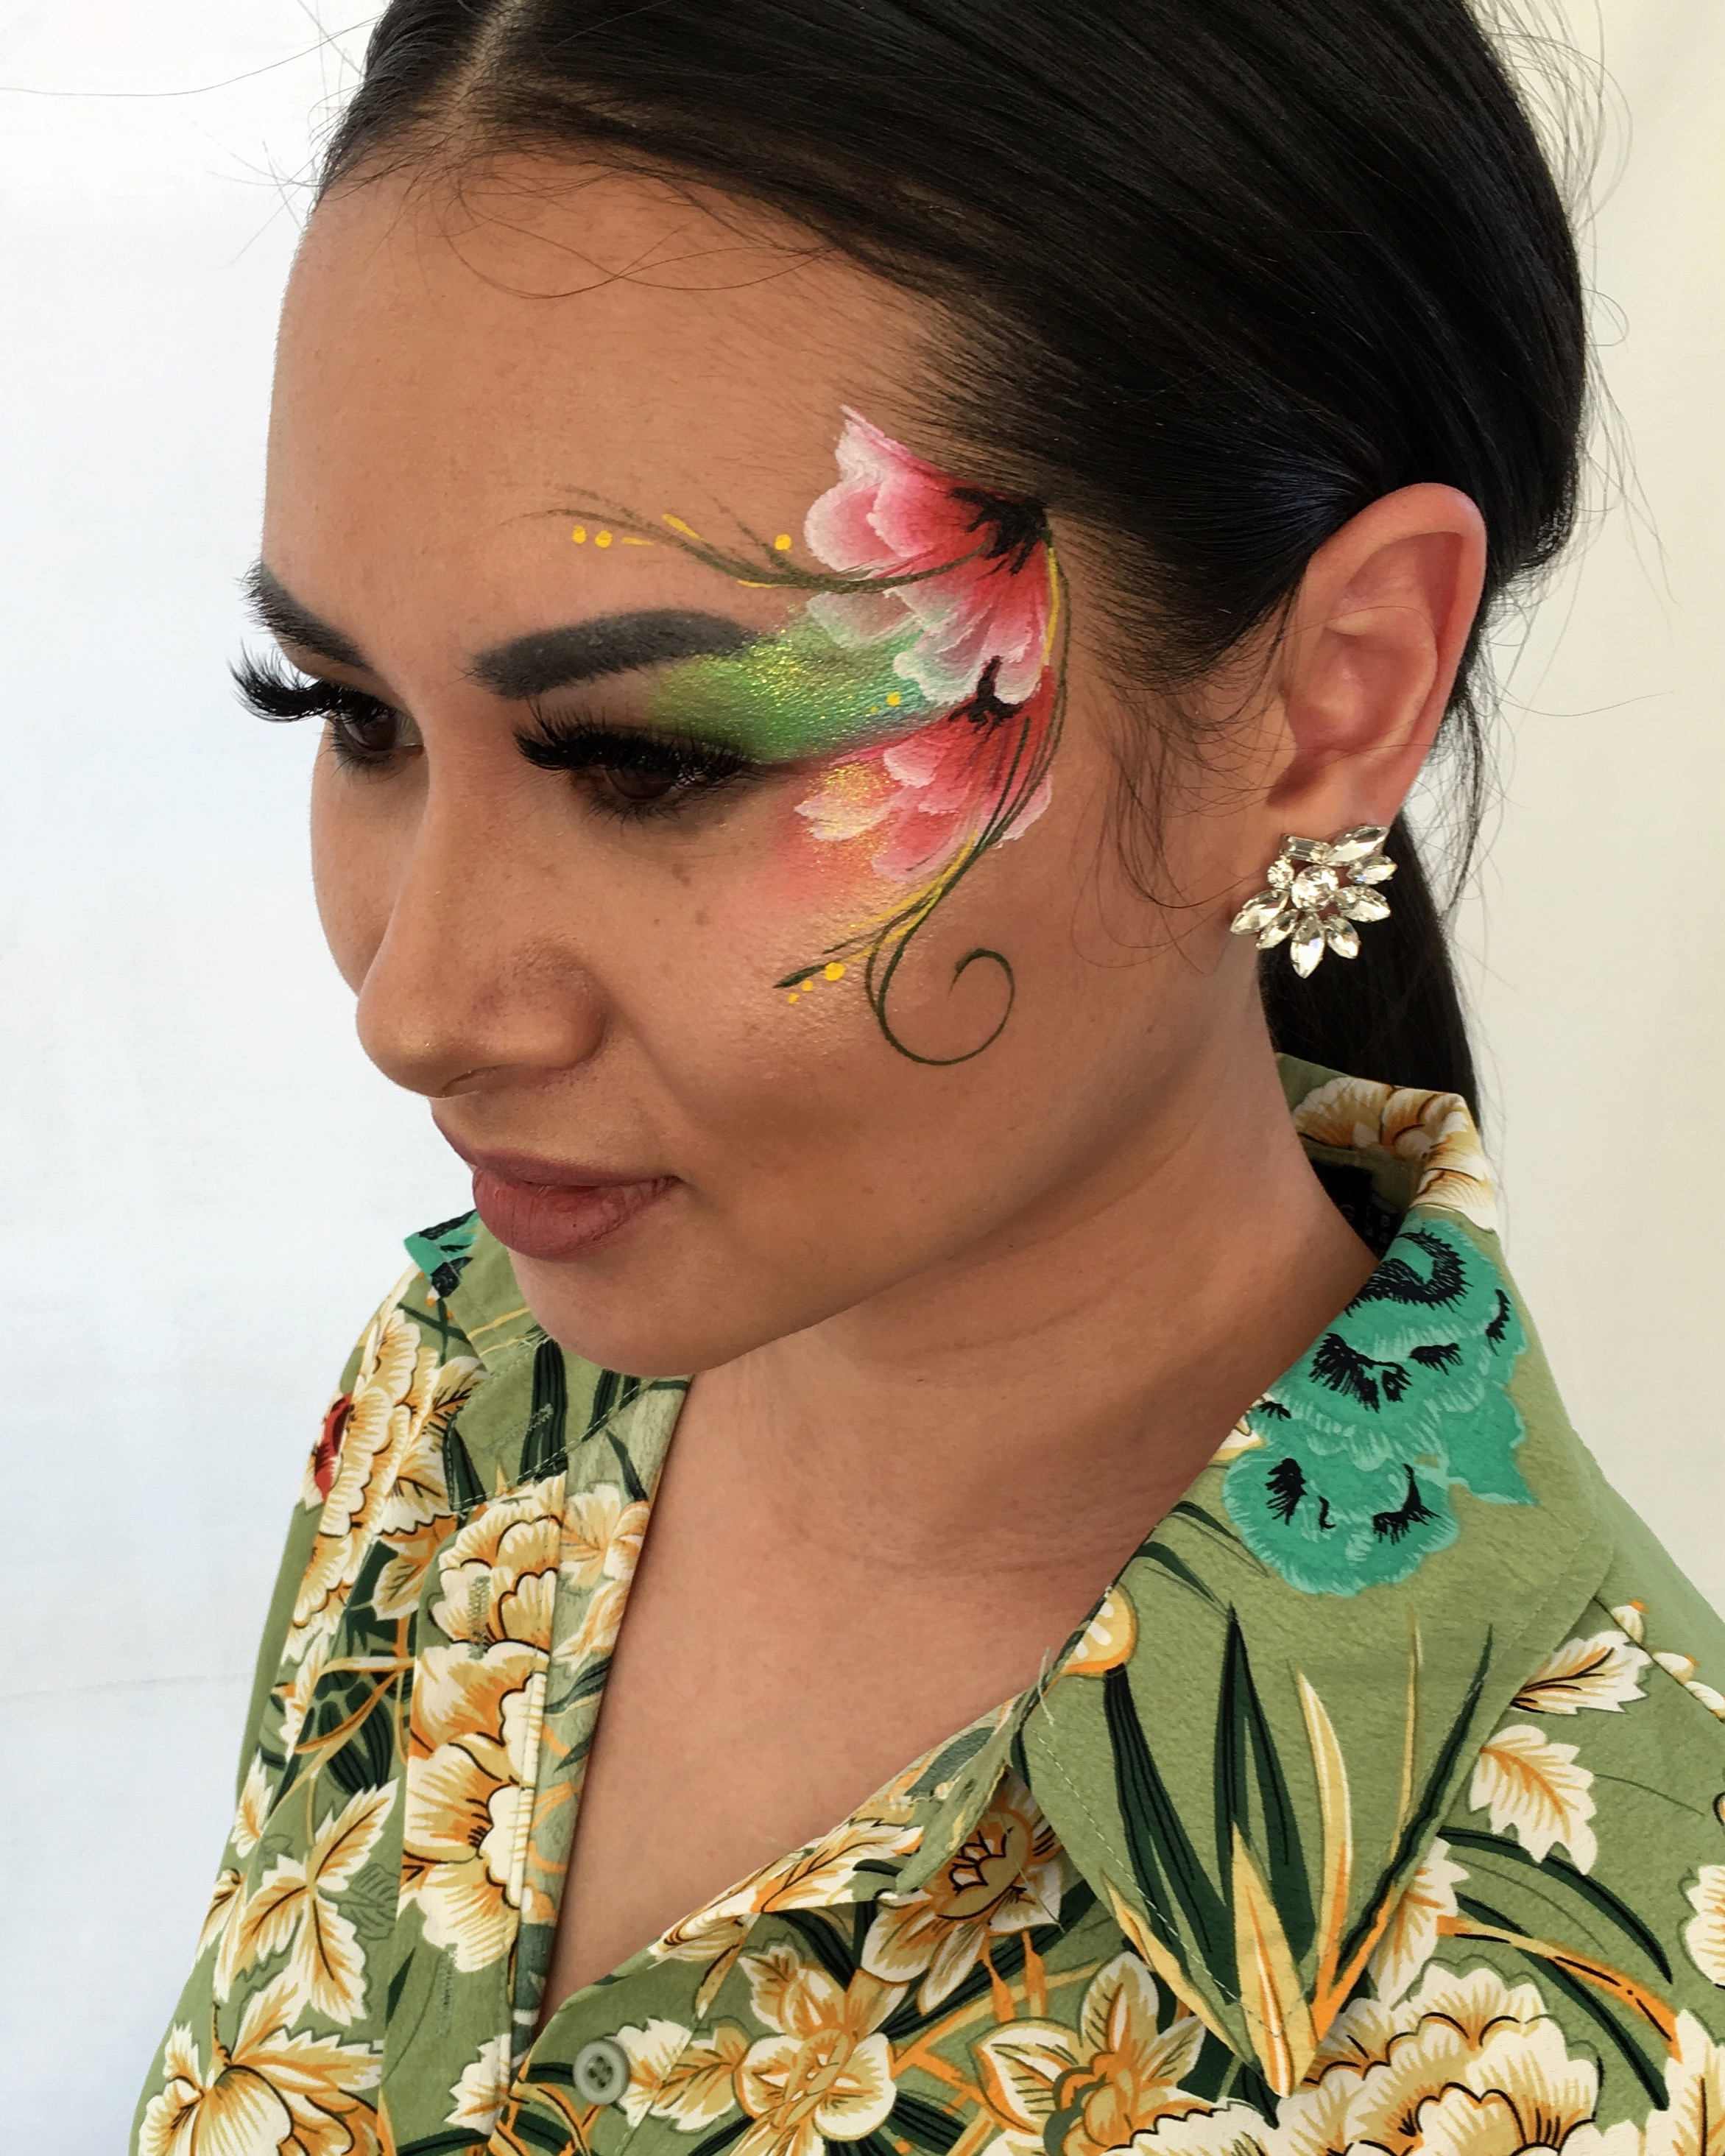 Minimalist floral eye design - Brierley Thorpe.JPG